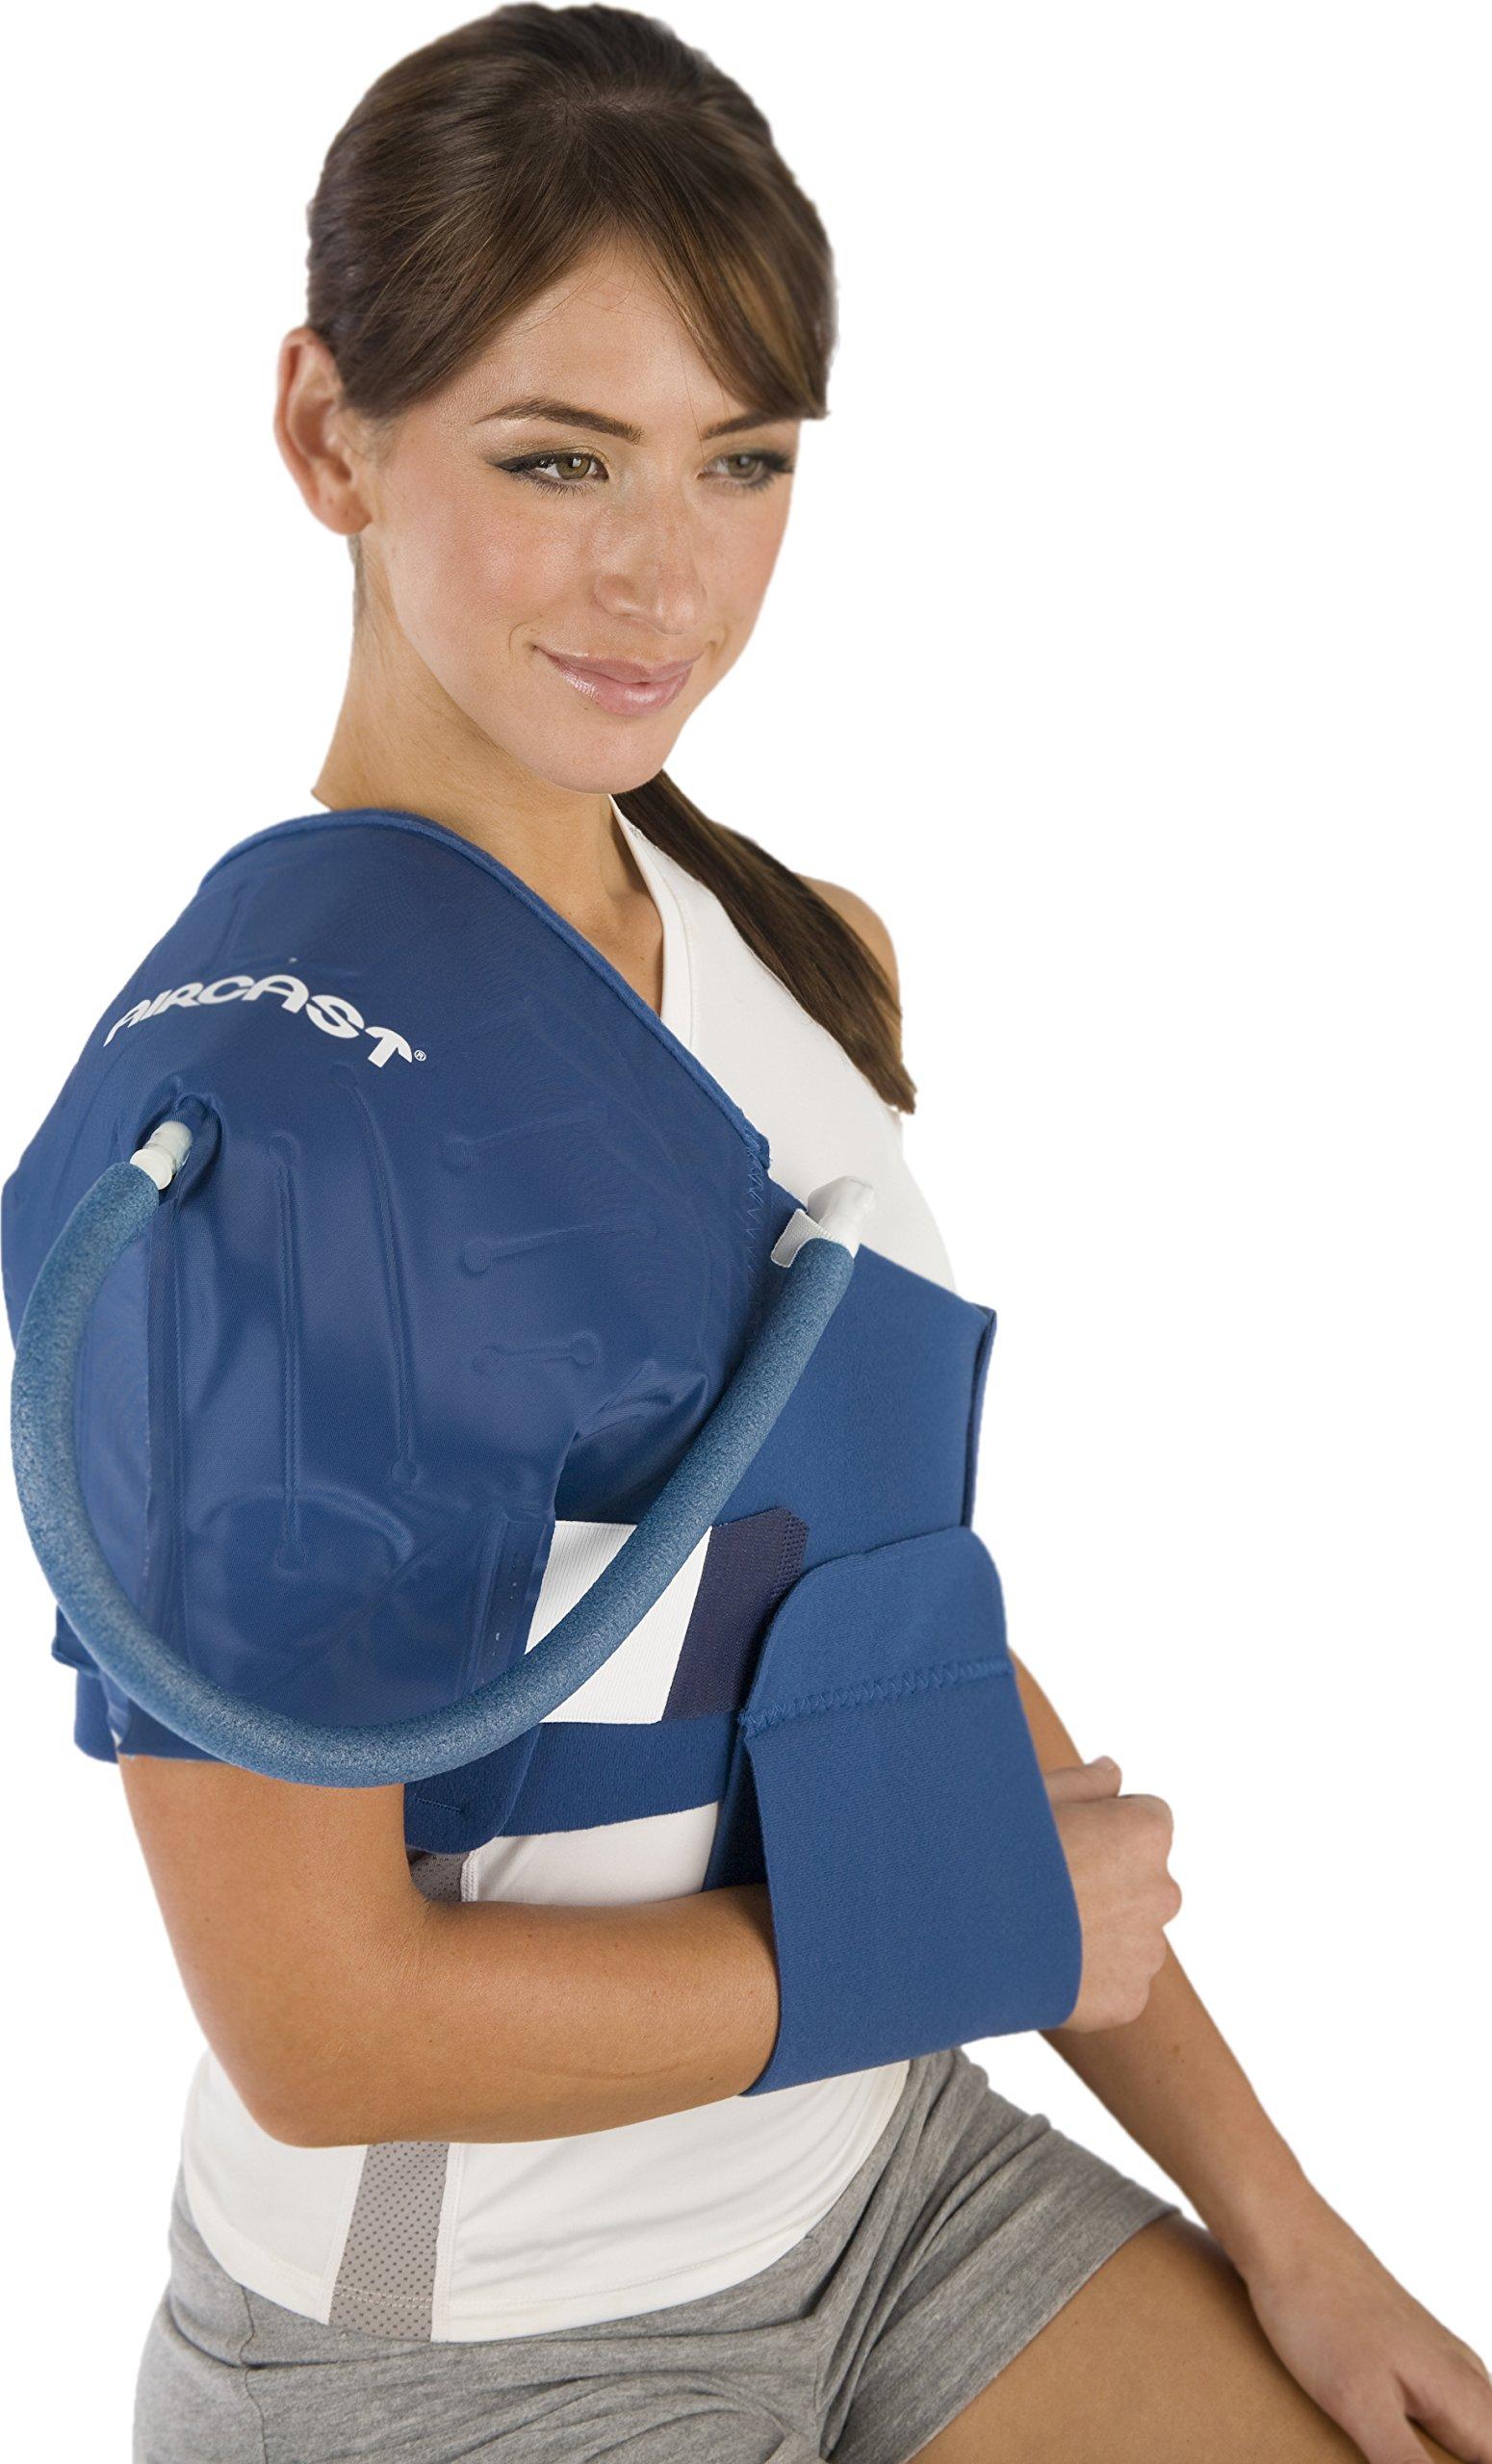 Aircast Shoulder Cryo/Cuff - X-Large